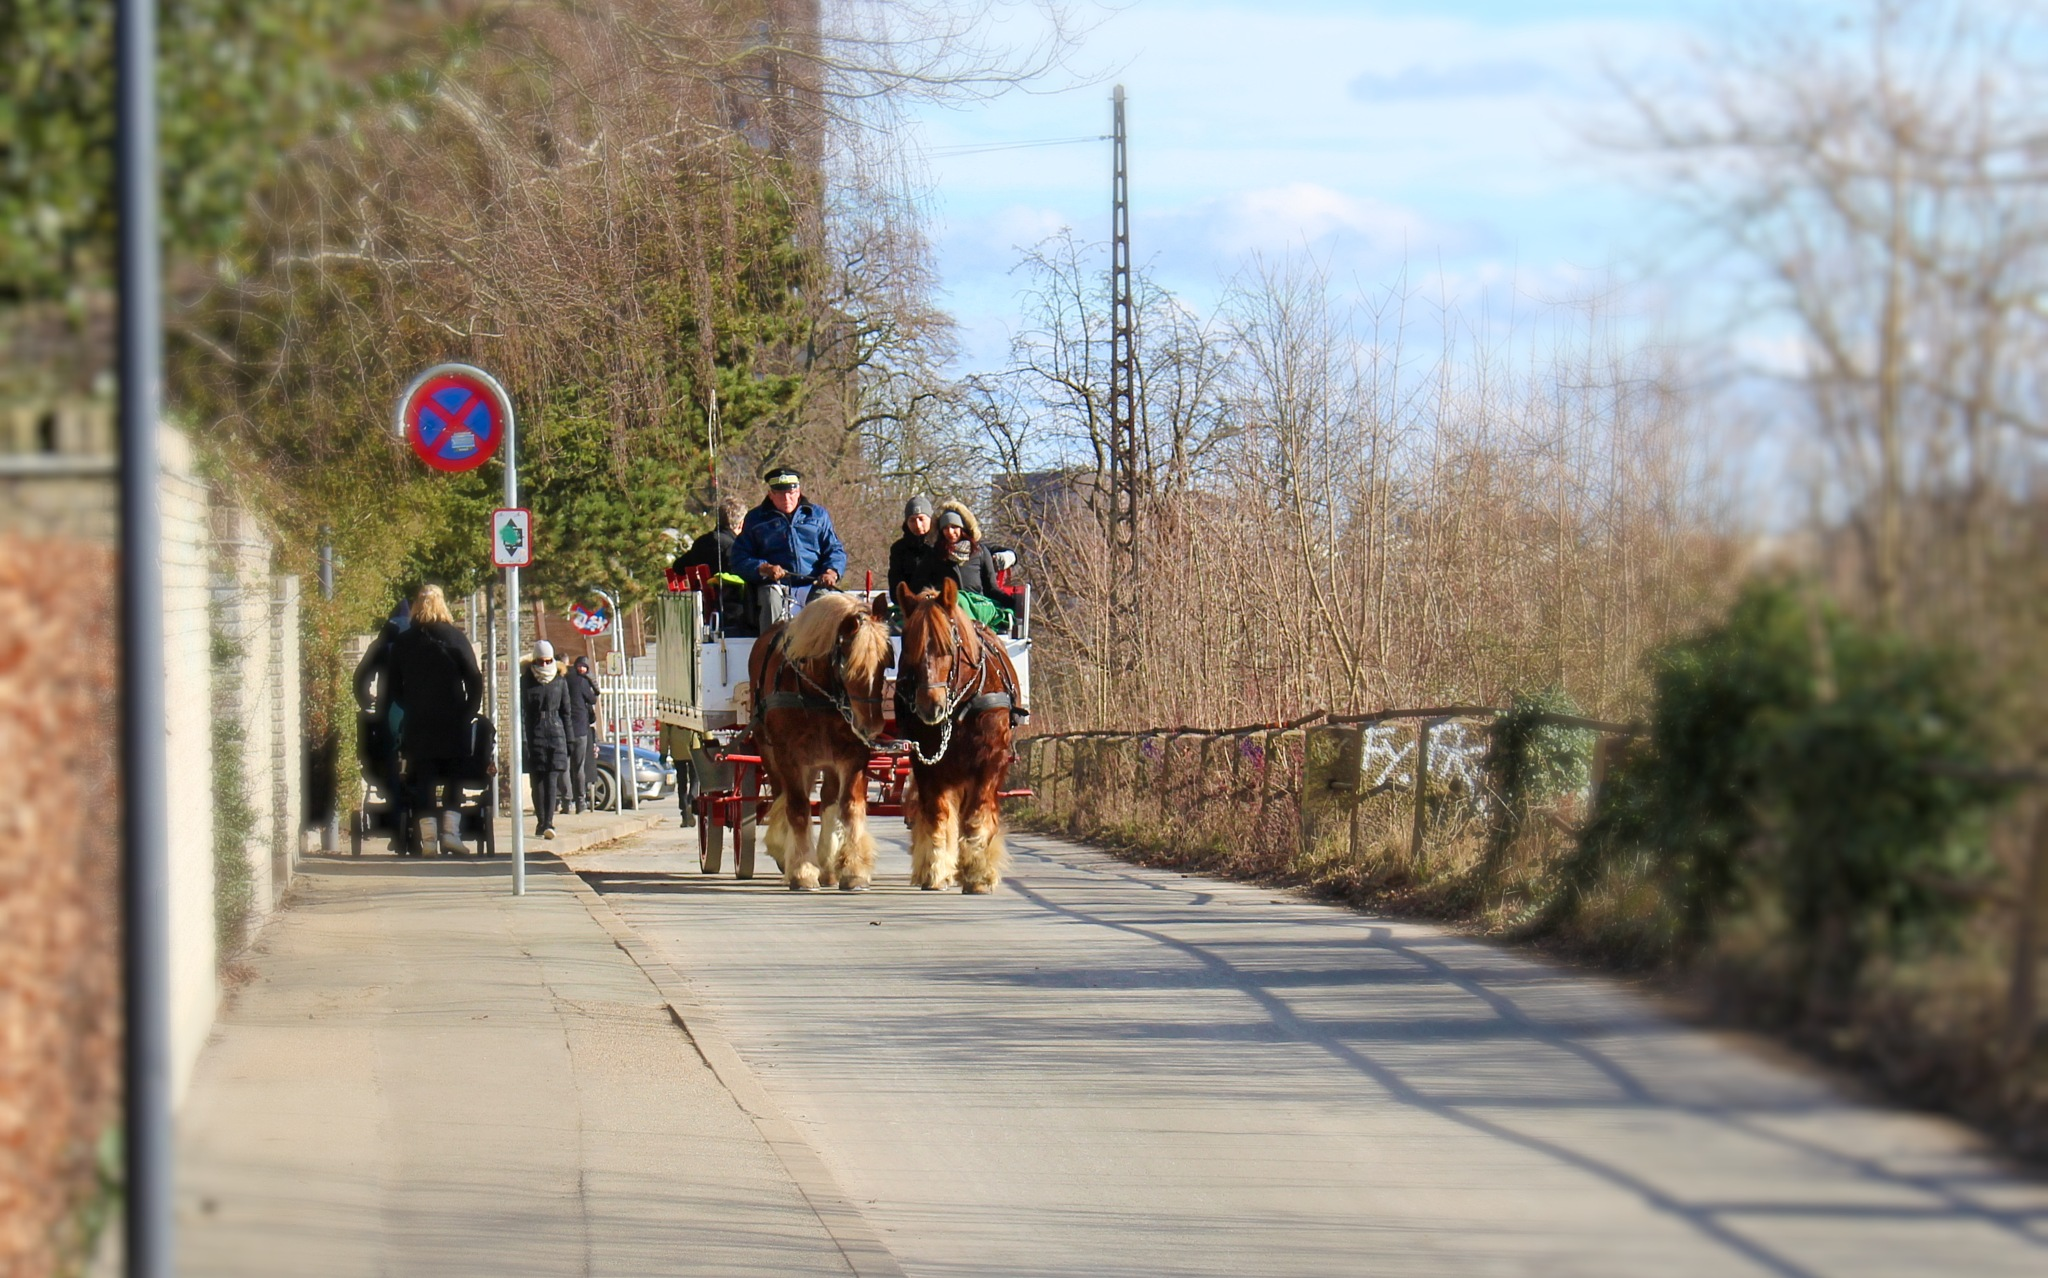 The Carlsberg brewery horses by Stig Norre Rasmussen